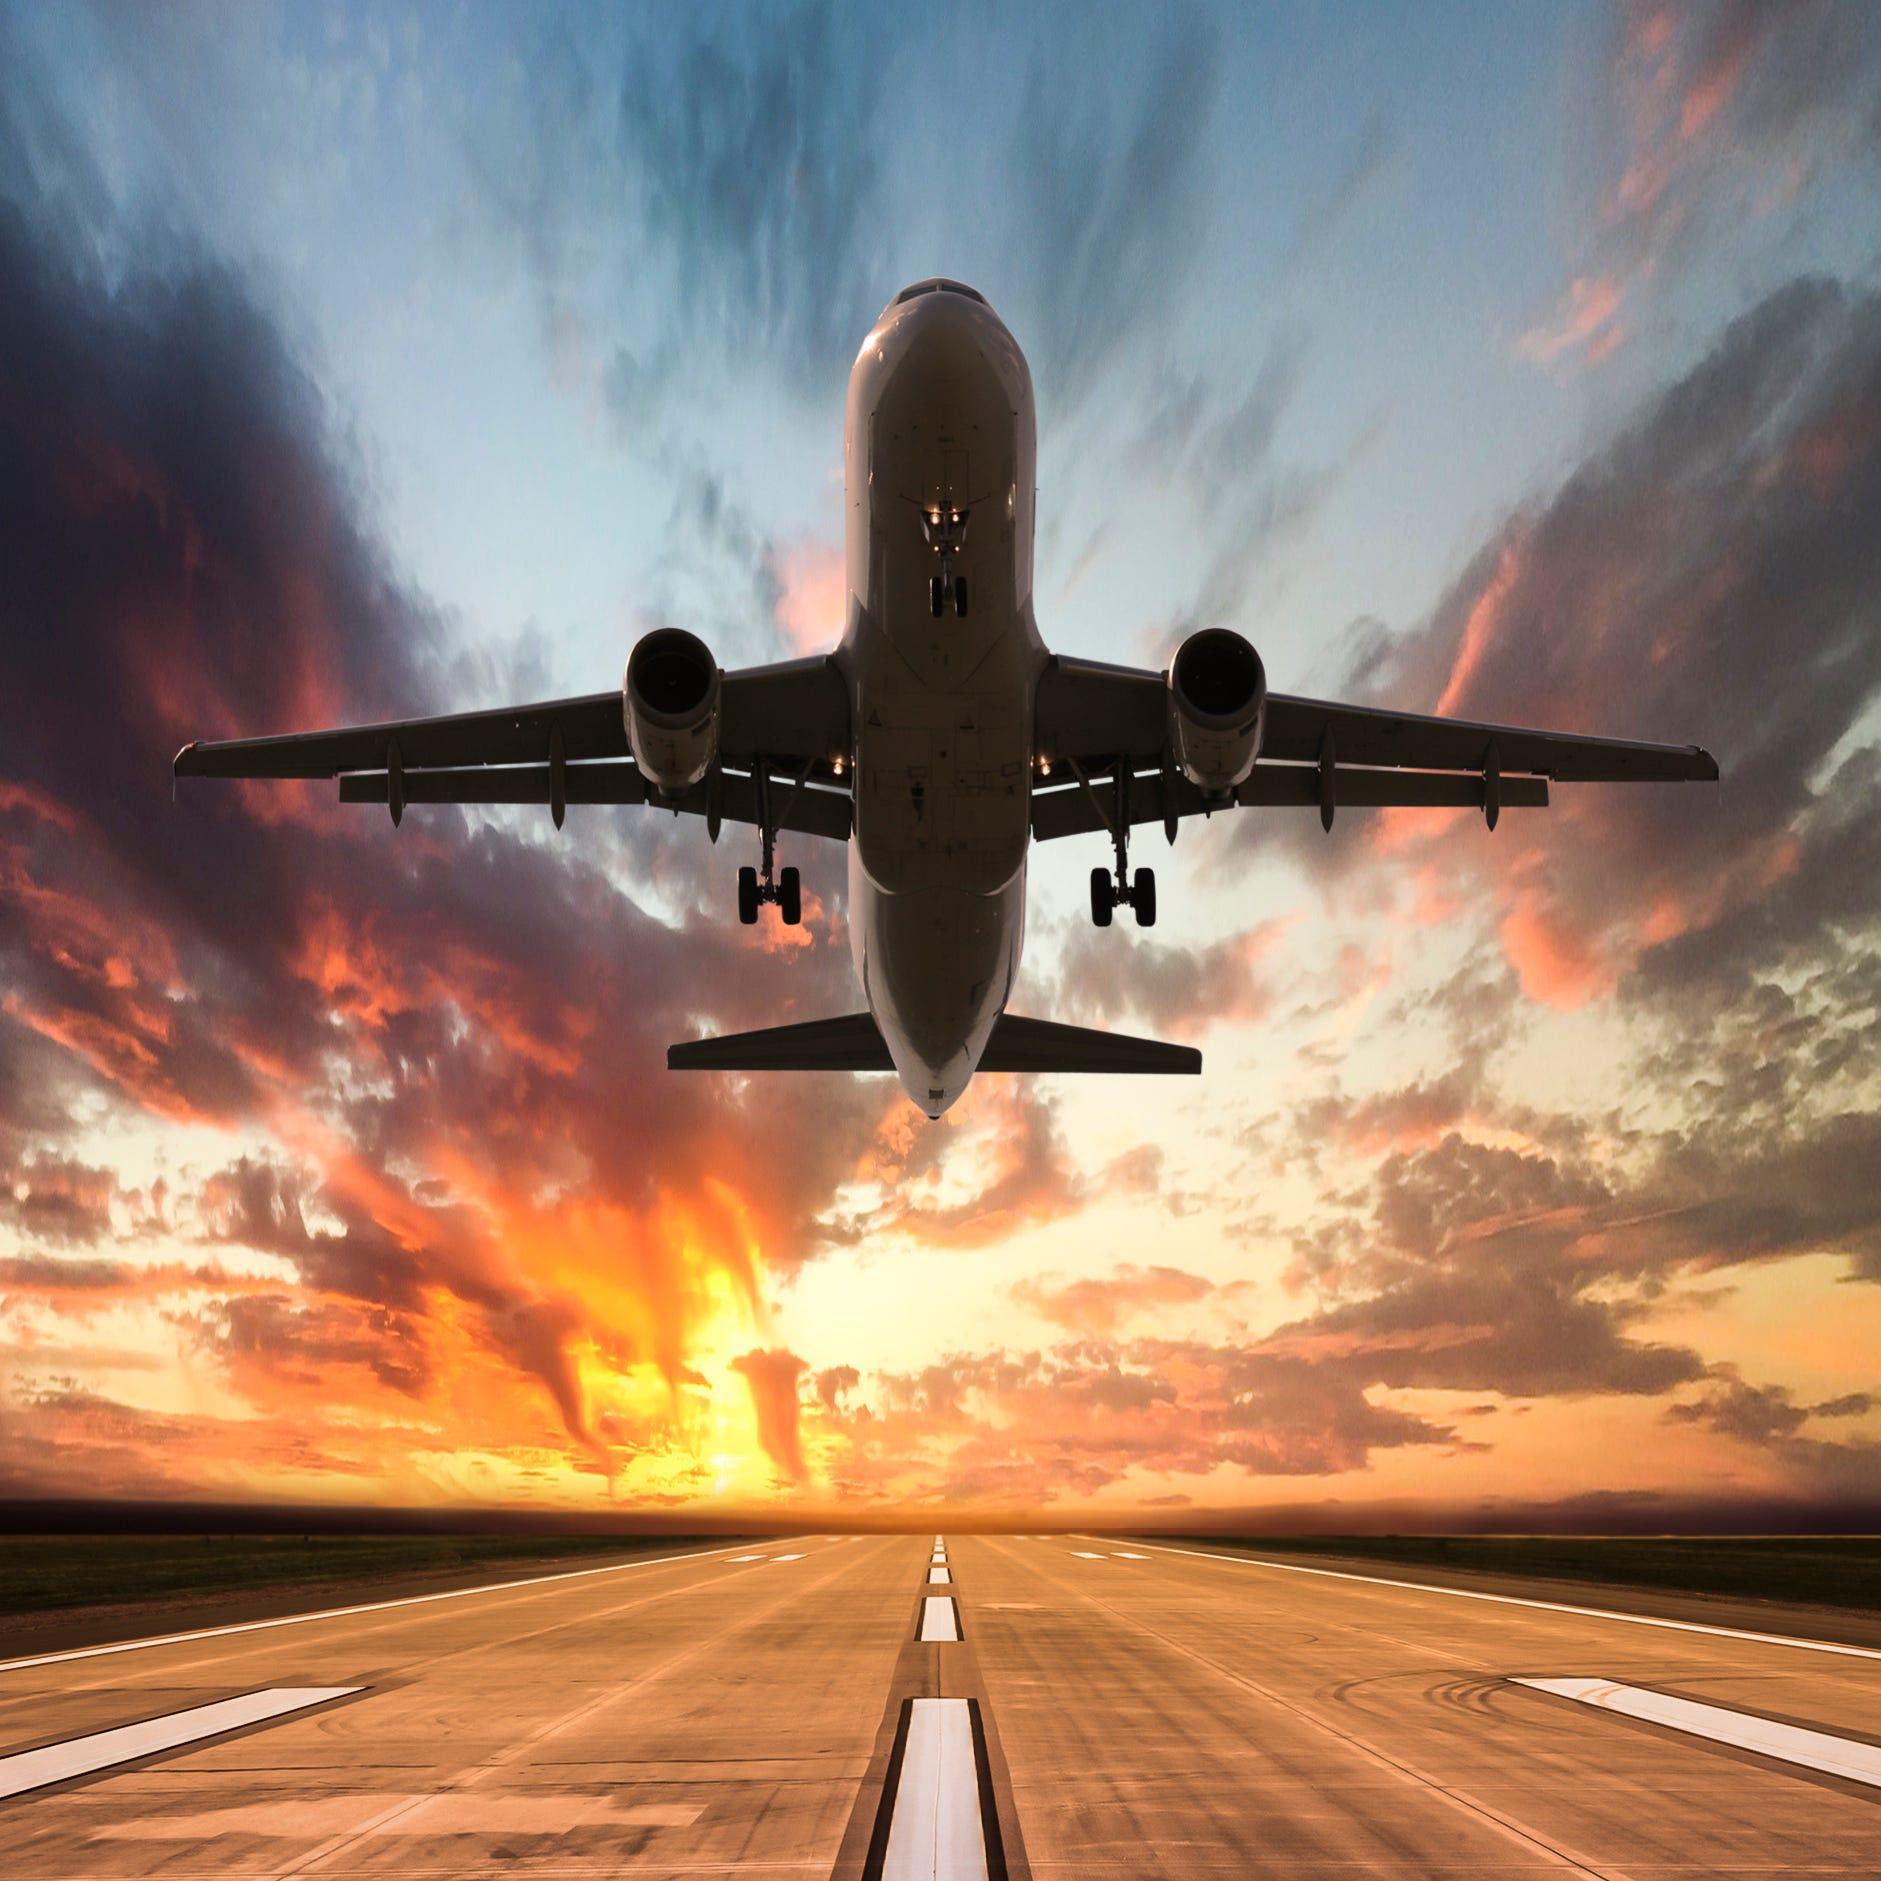 Hagerstown, Md., airport adds nonstop flights to Myrtle Beach